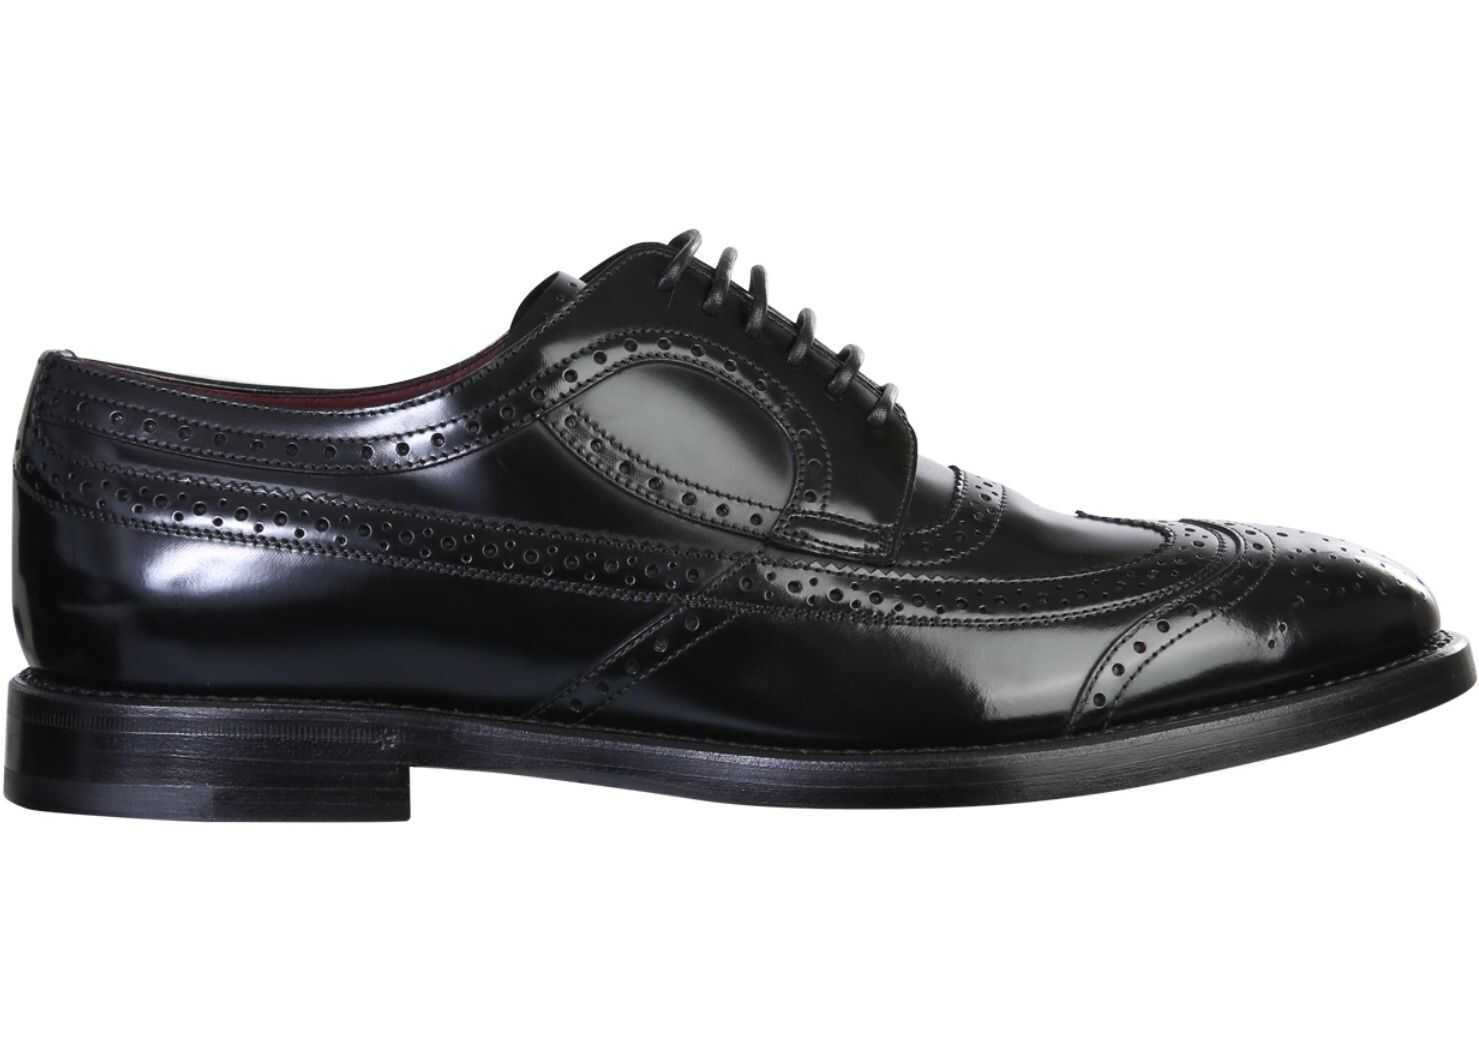 Dolce & Gabbana Derby Brogue Shoes A20137_A120380999 BLACK imagine b-mall.ro